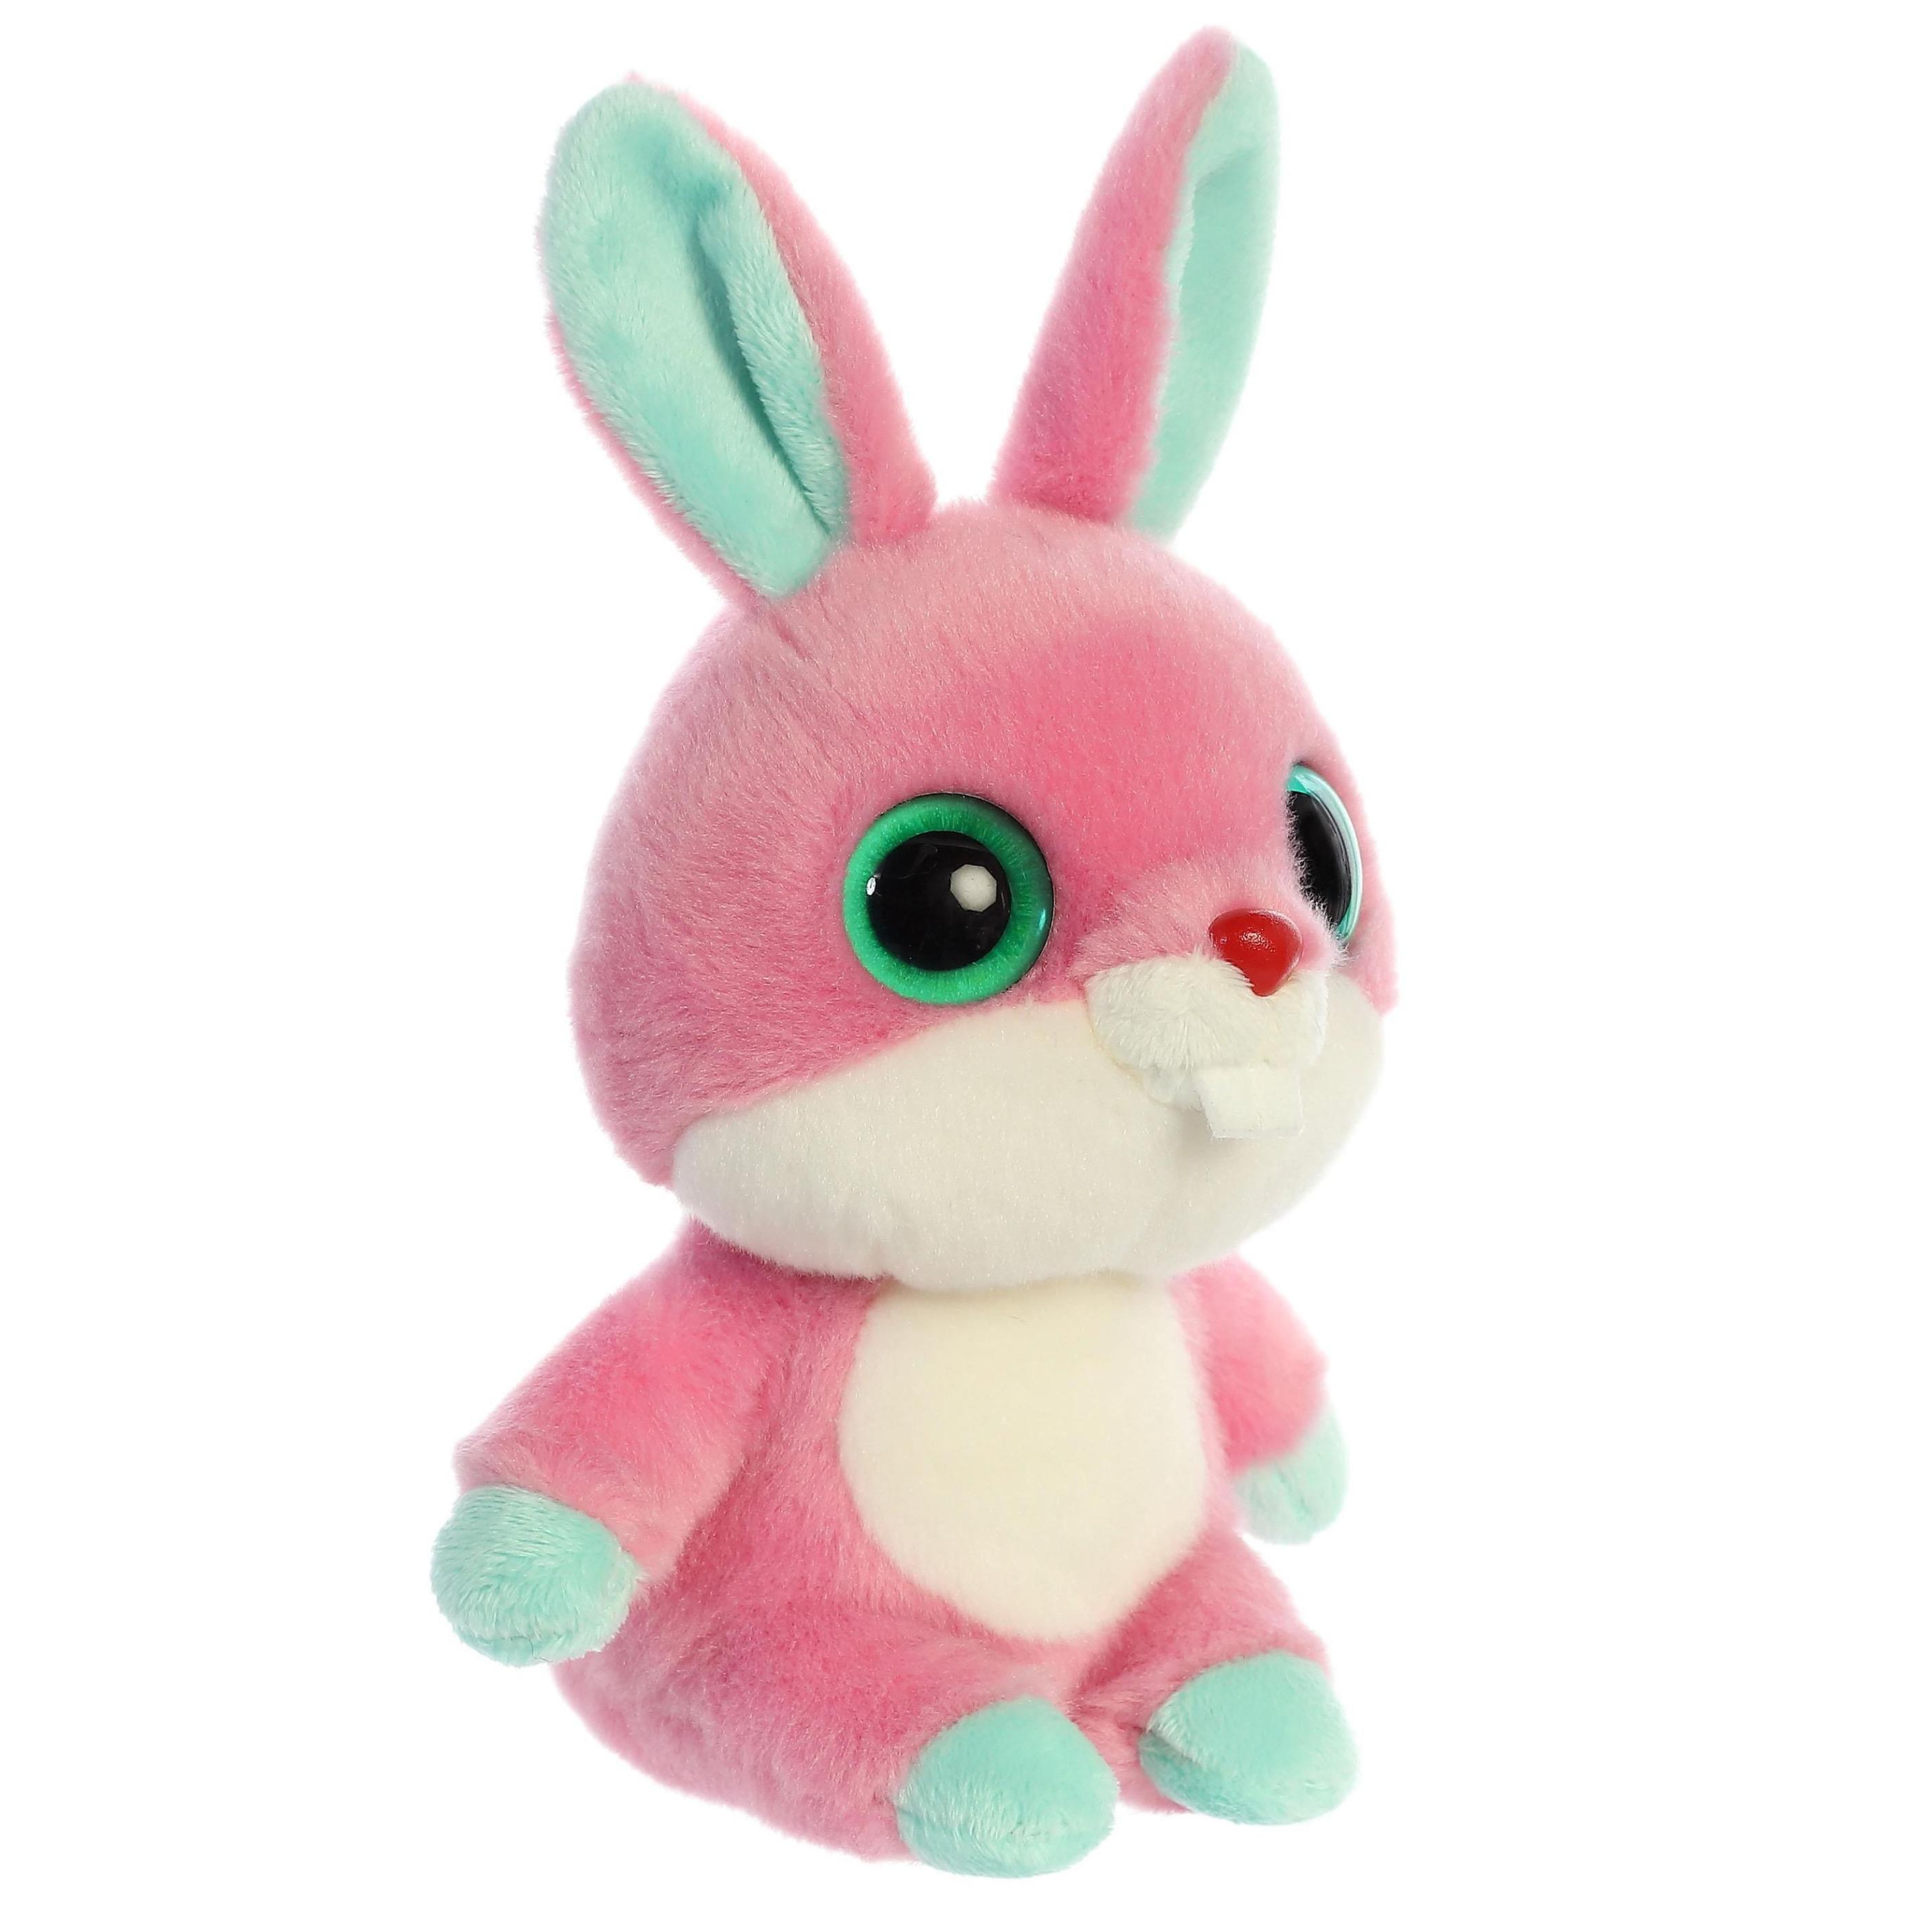 Pluche roze konijn knuffel 20 cm